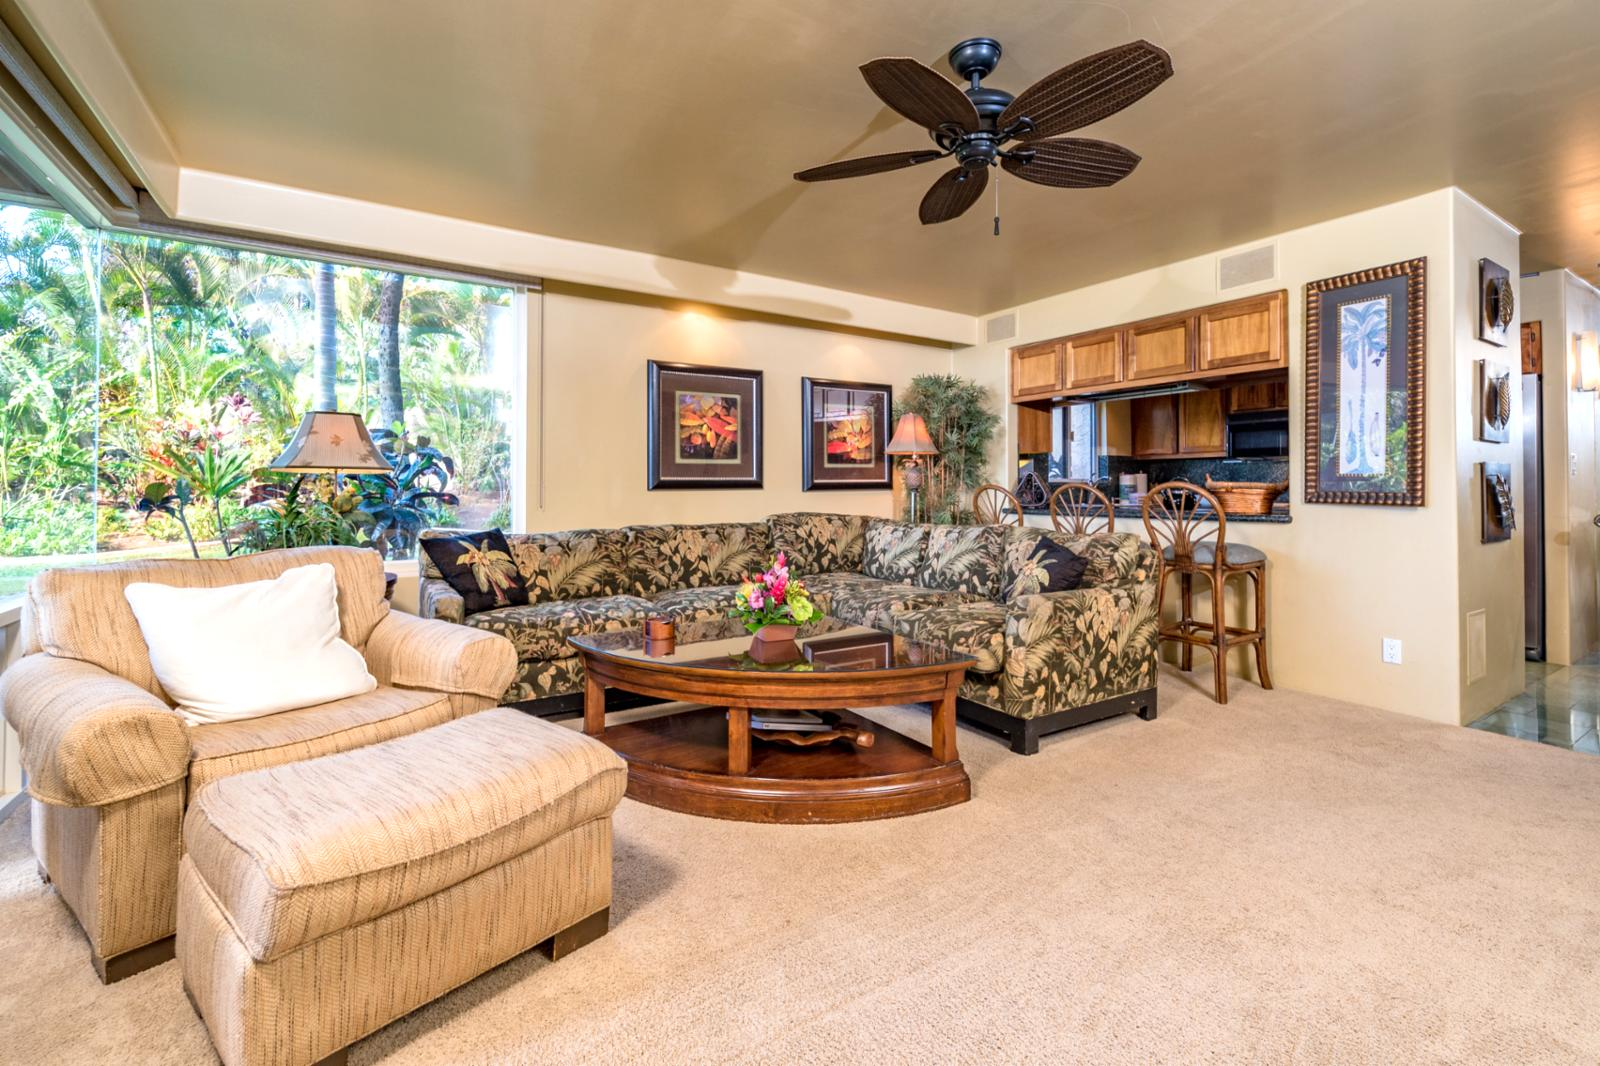 Large comfortable sofa with oversized layout